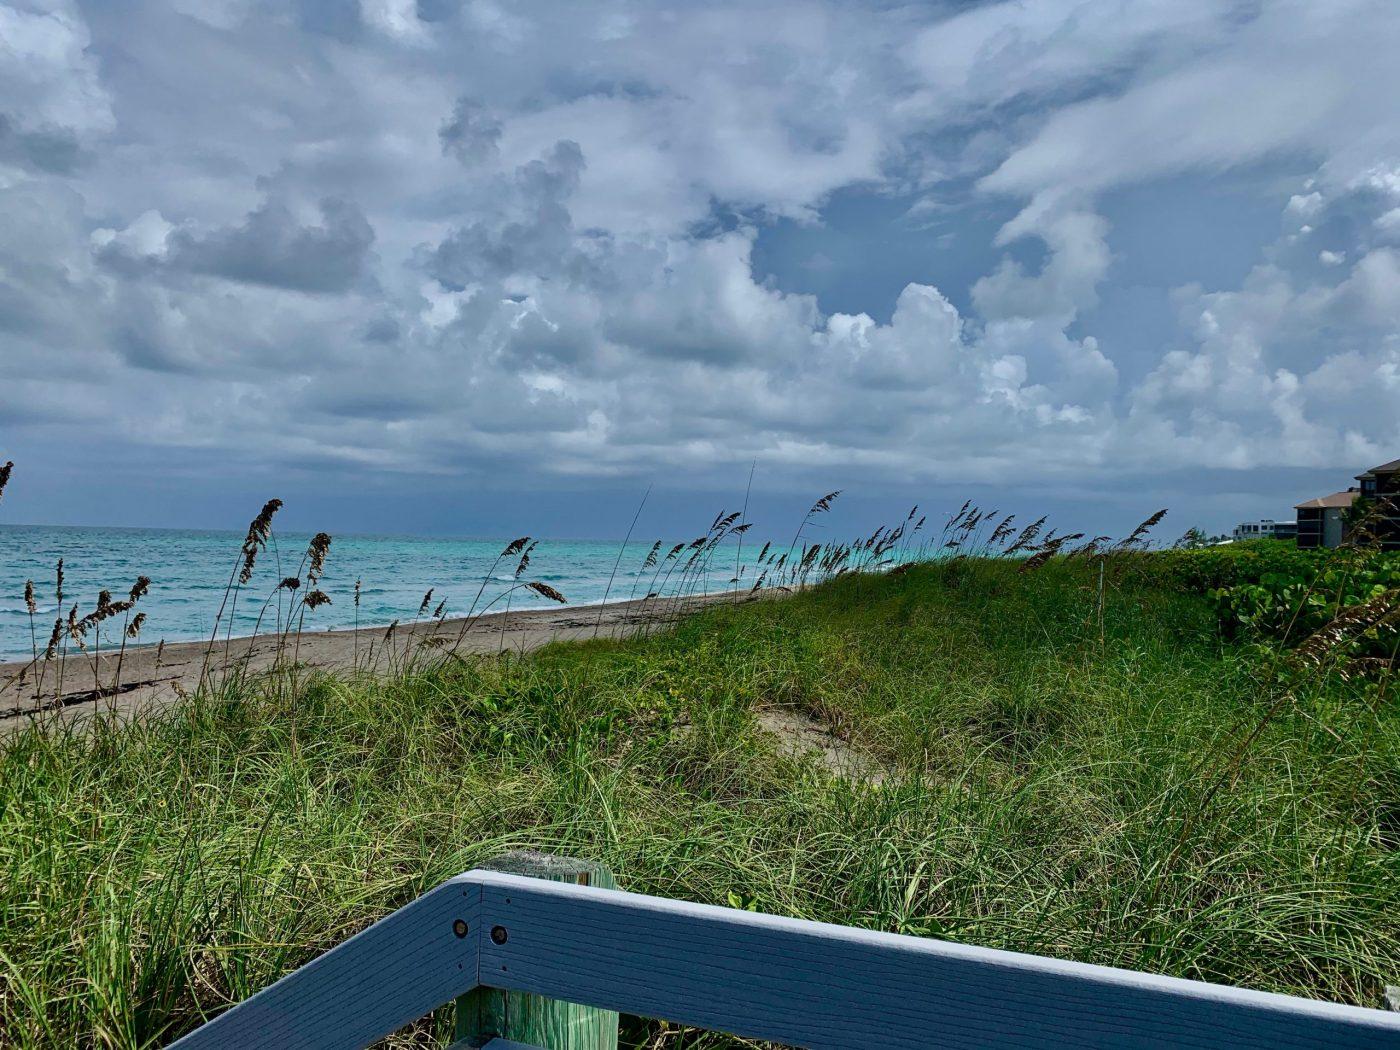 Martin County Beaches: Bryn Mawr Beach